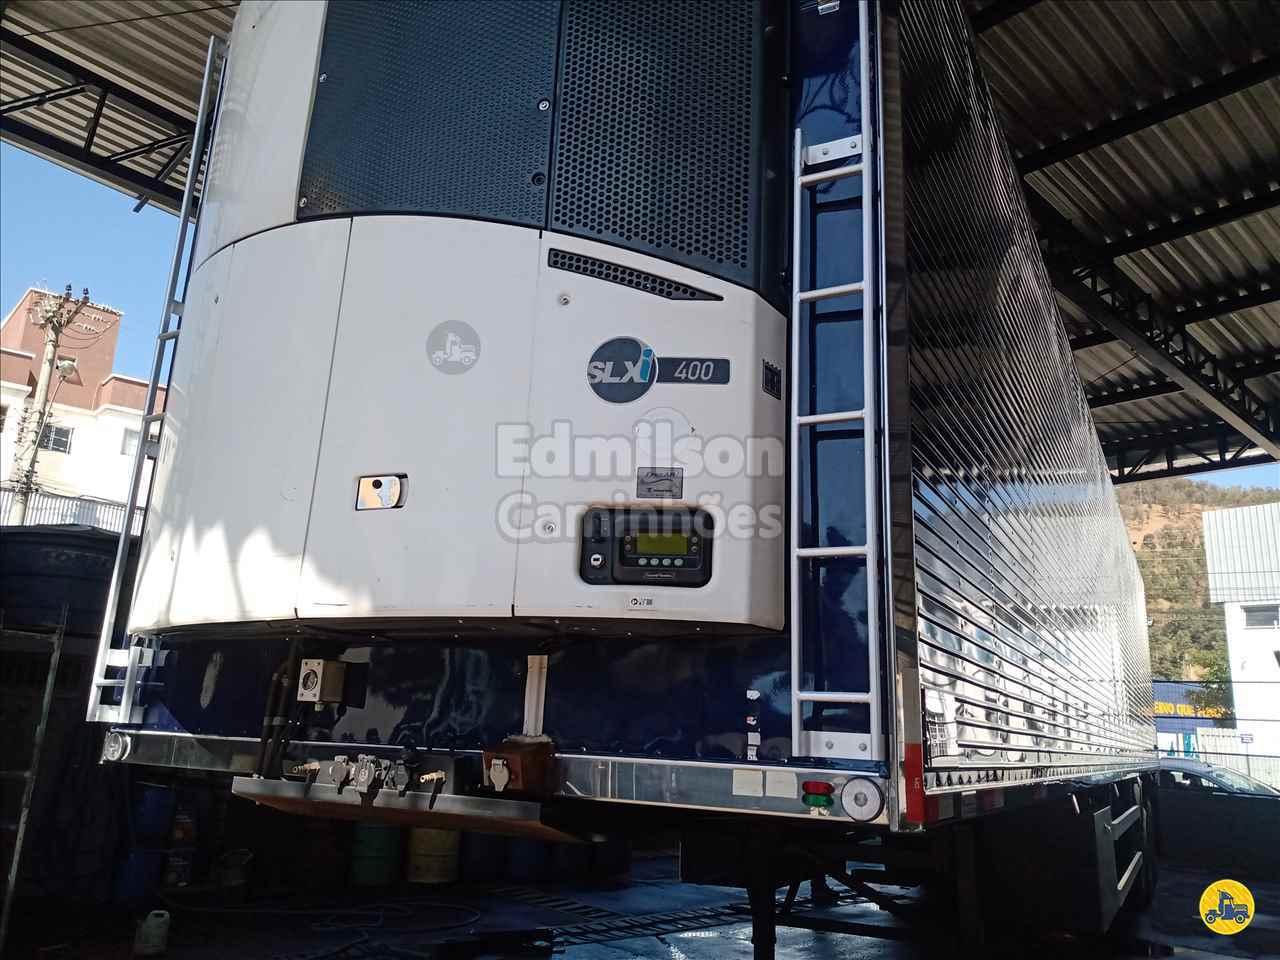 CARRETA SEMI-REBOQUE FRIGORIFICO Edmilson Caminhões Itajubá MG ITAJUBA MINAS GERAIS MG